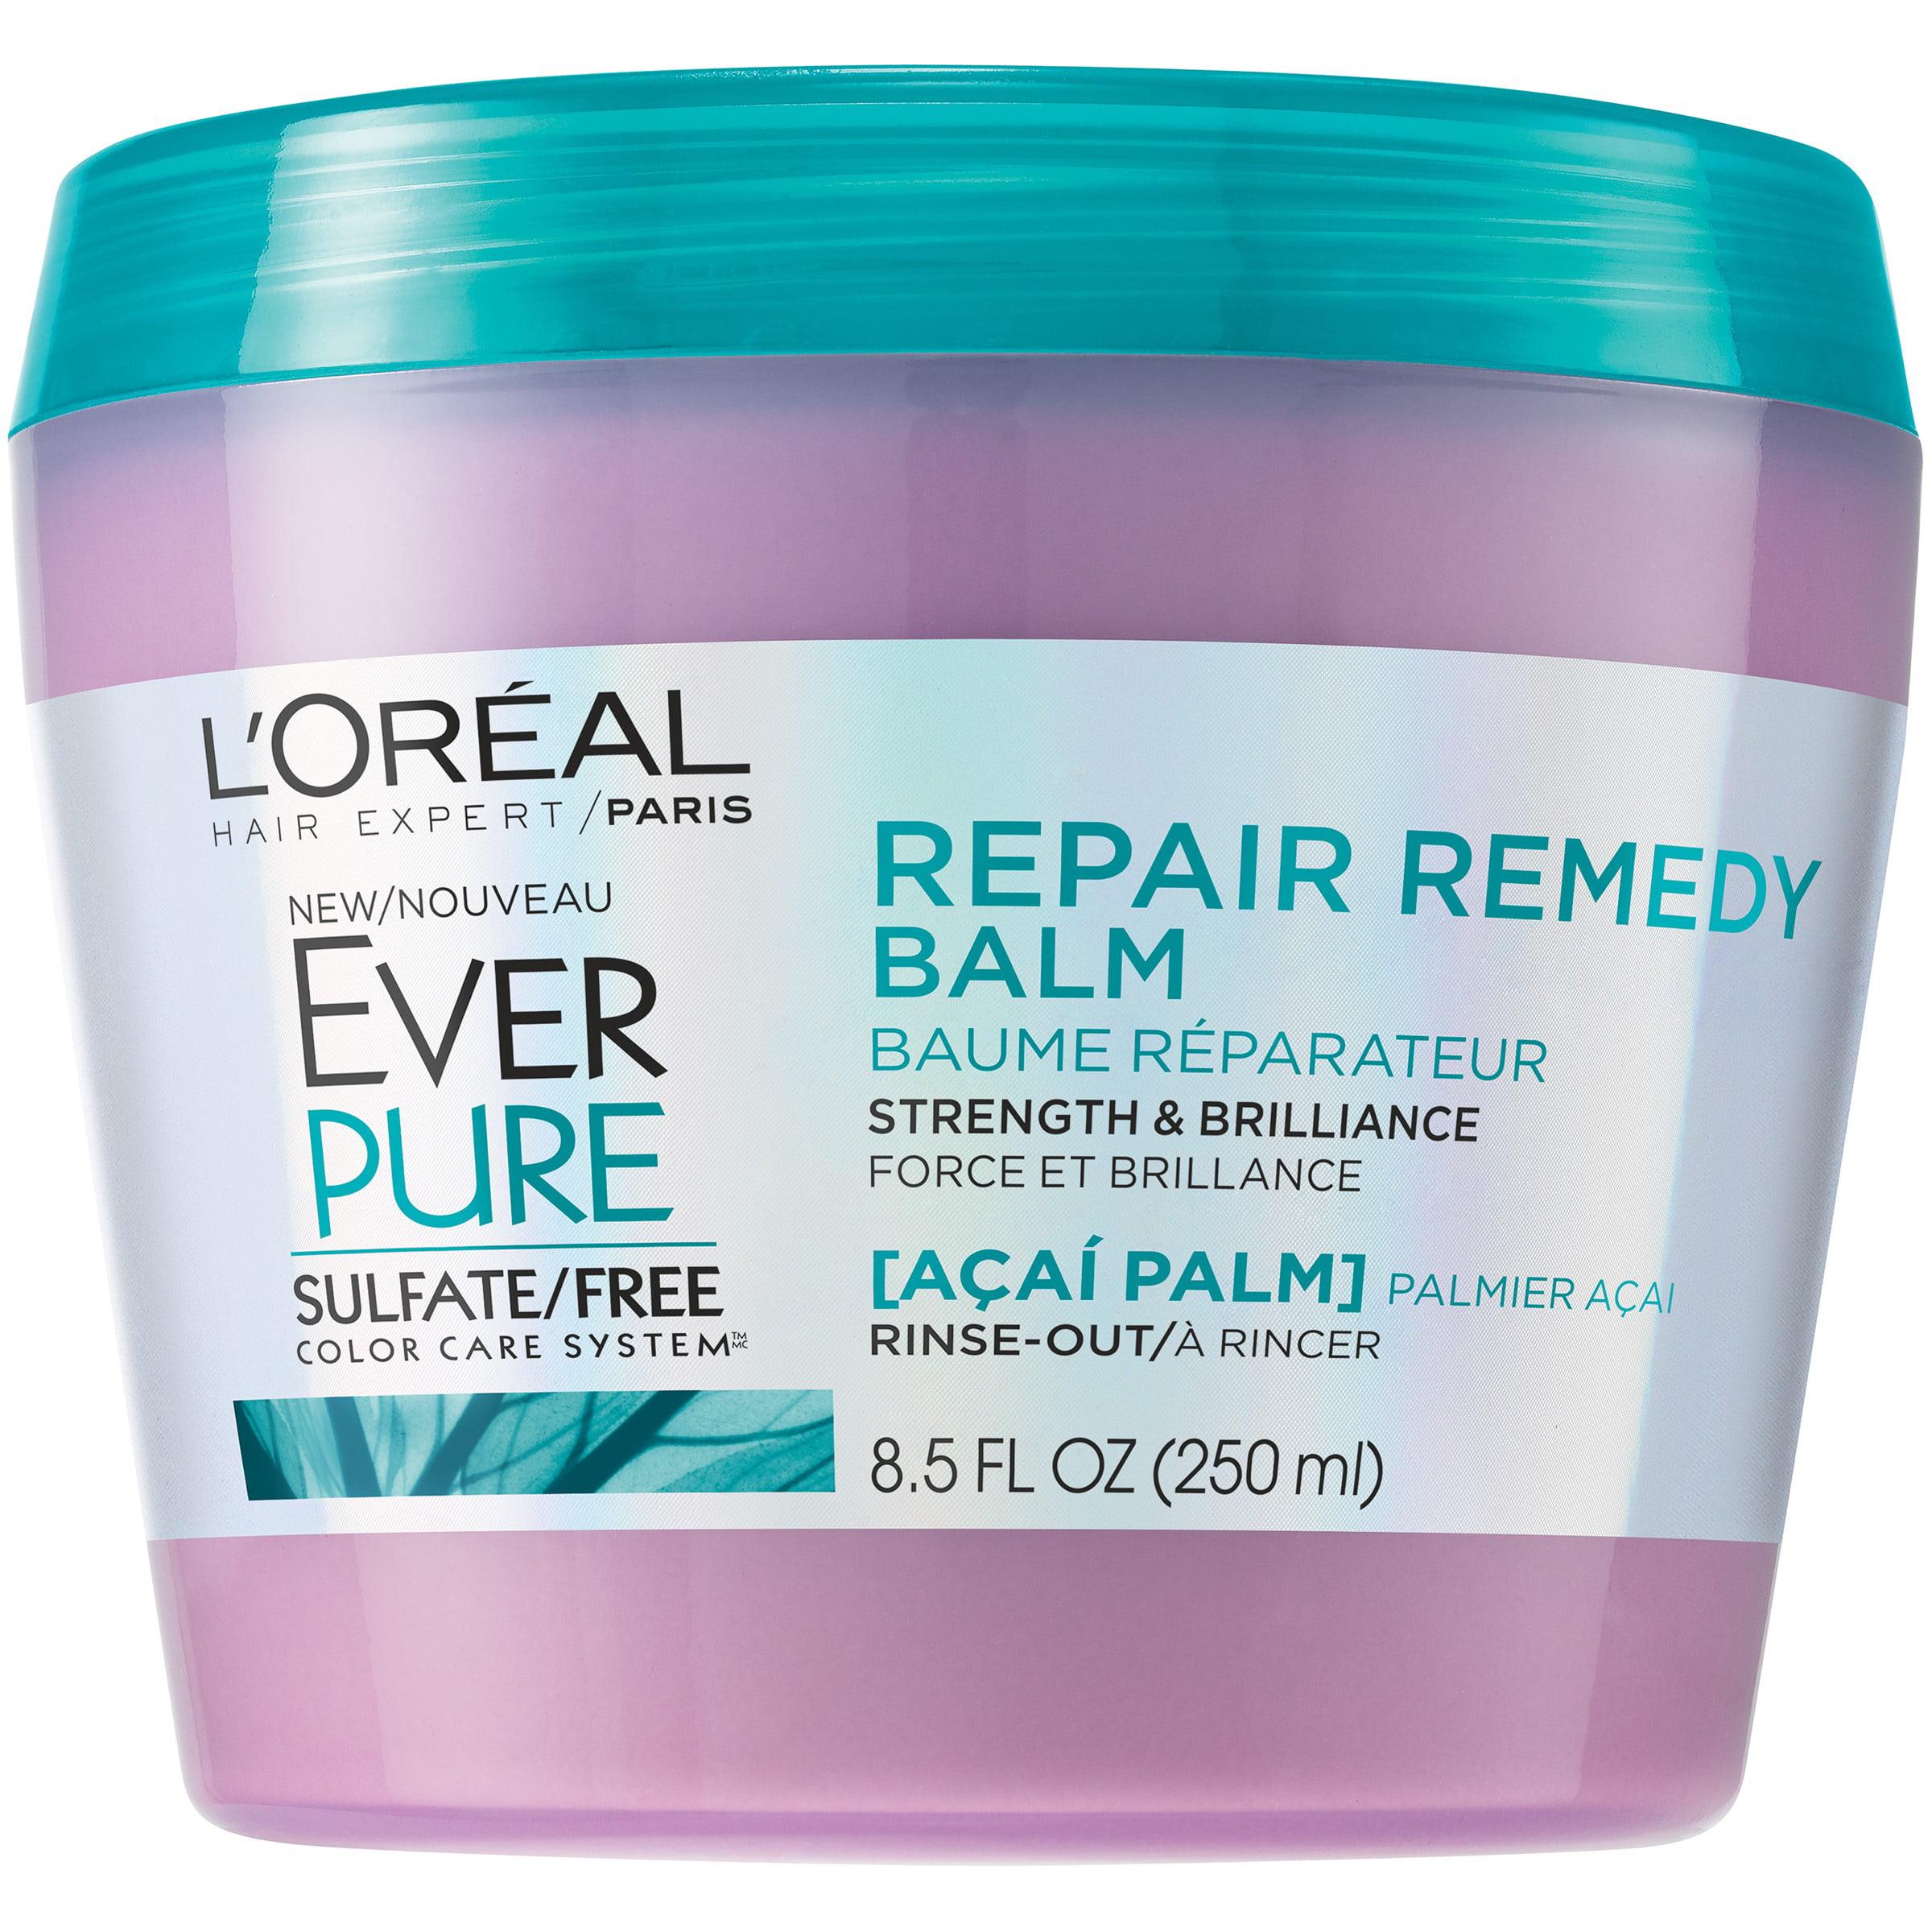 L'Oreal Paris EverPure Repair Remedy Balm, Acai Palm, 8.5 Fl Oz